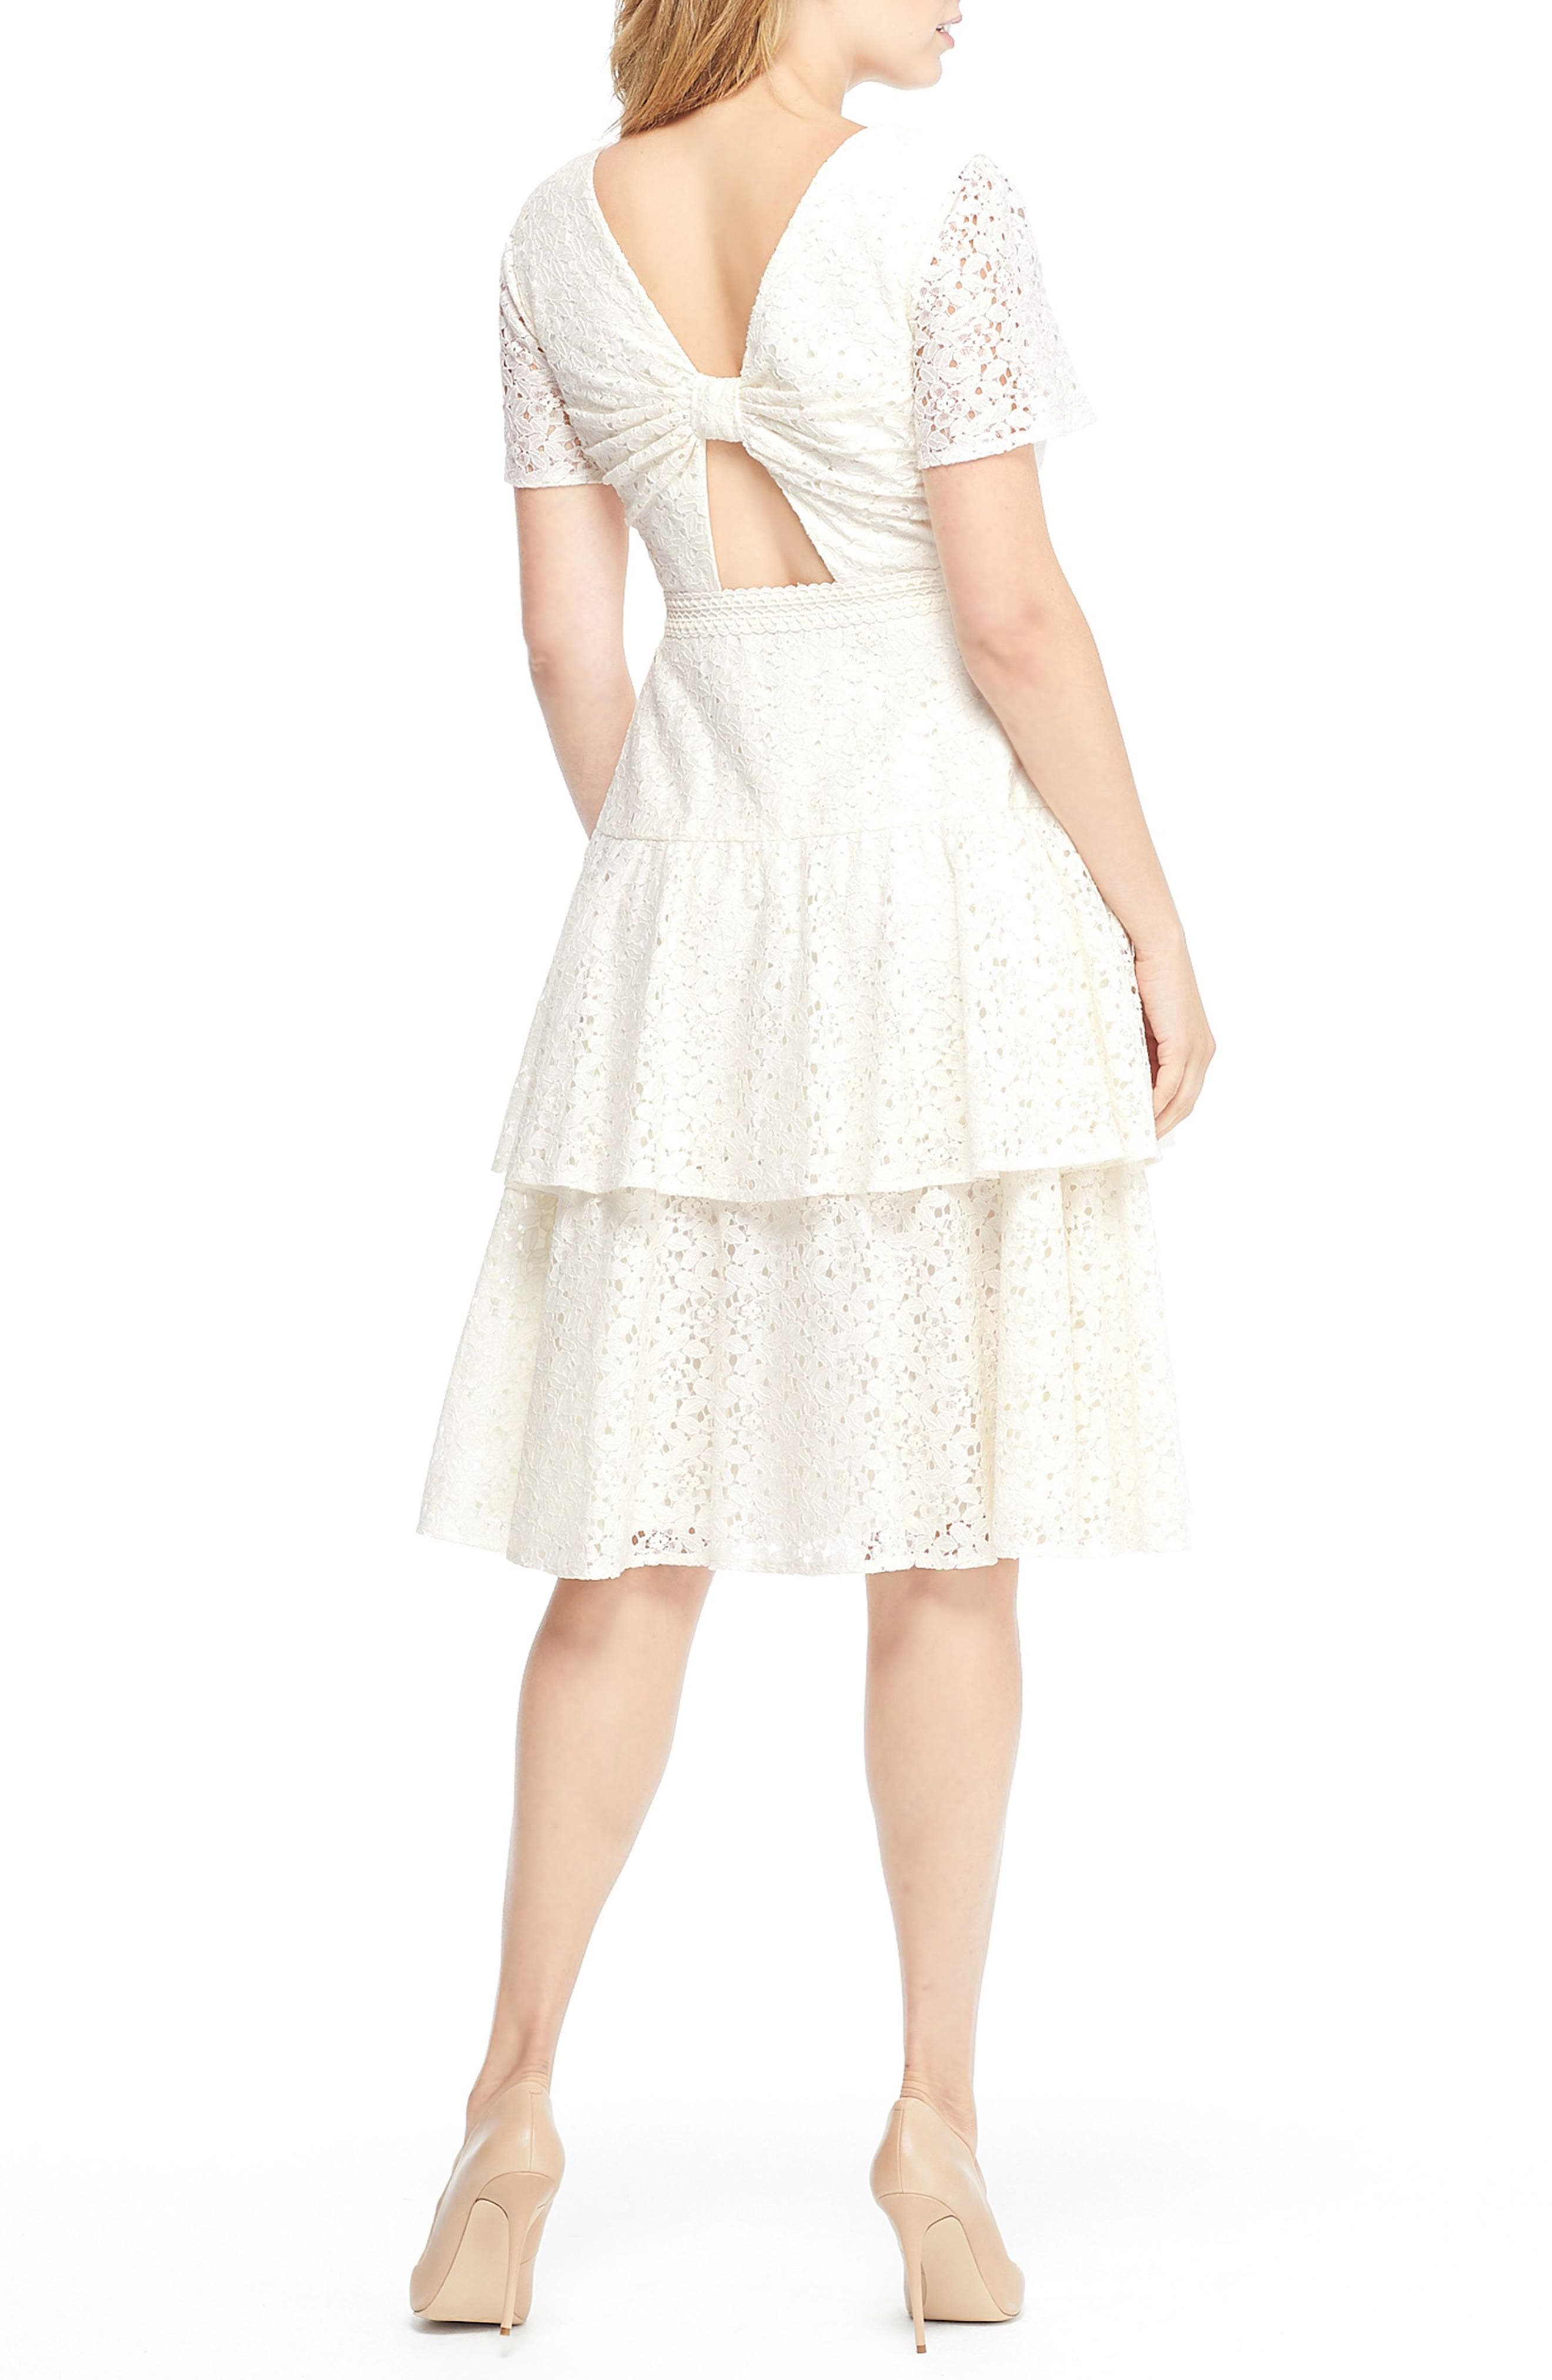 Doris Bow Back Tiered Skirt Lace Dress,                             Alternate thumbnail 2, color,                             CREAM